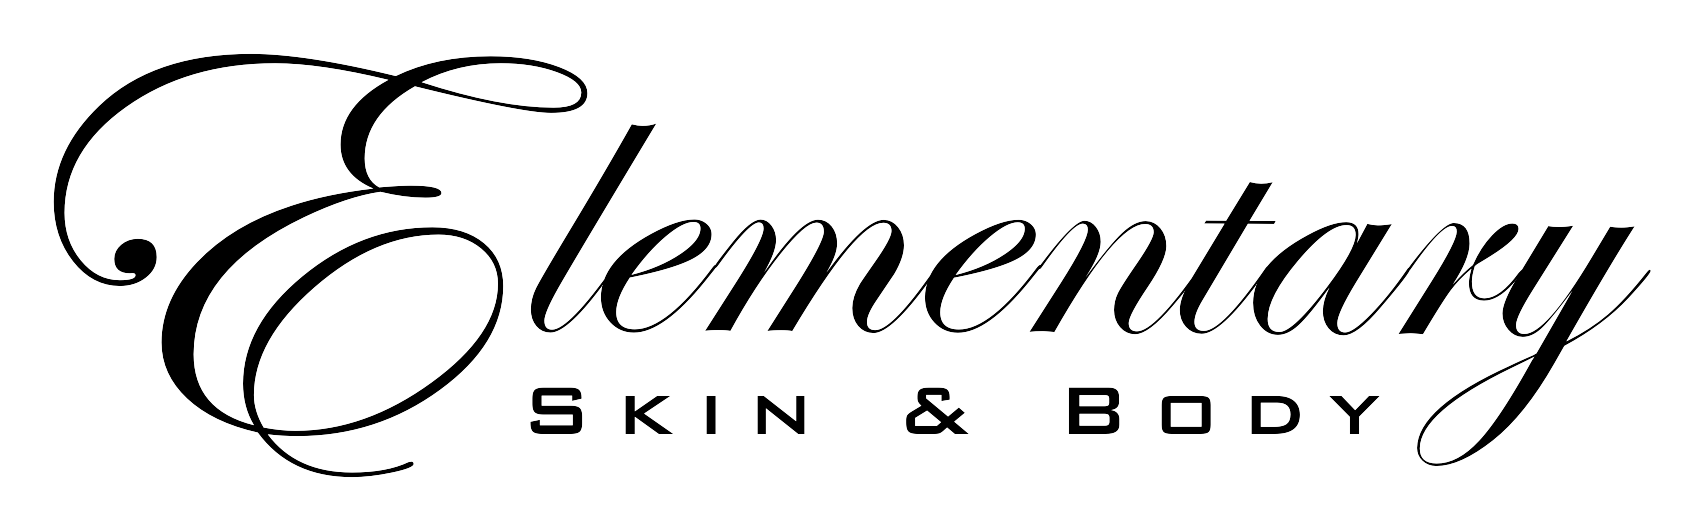 Elementary Skin & Body